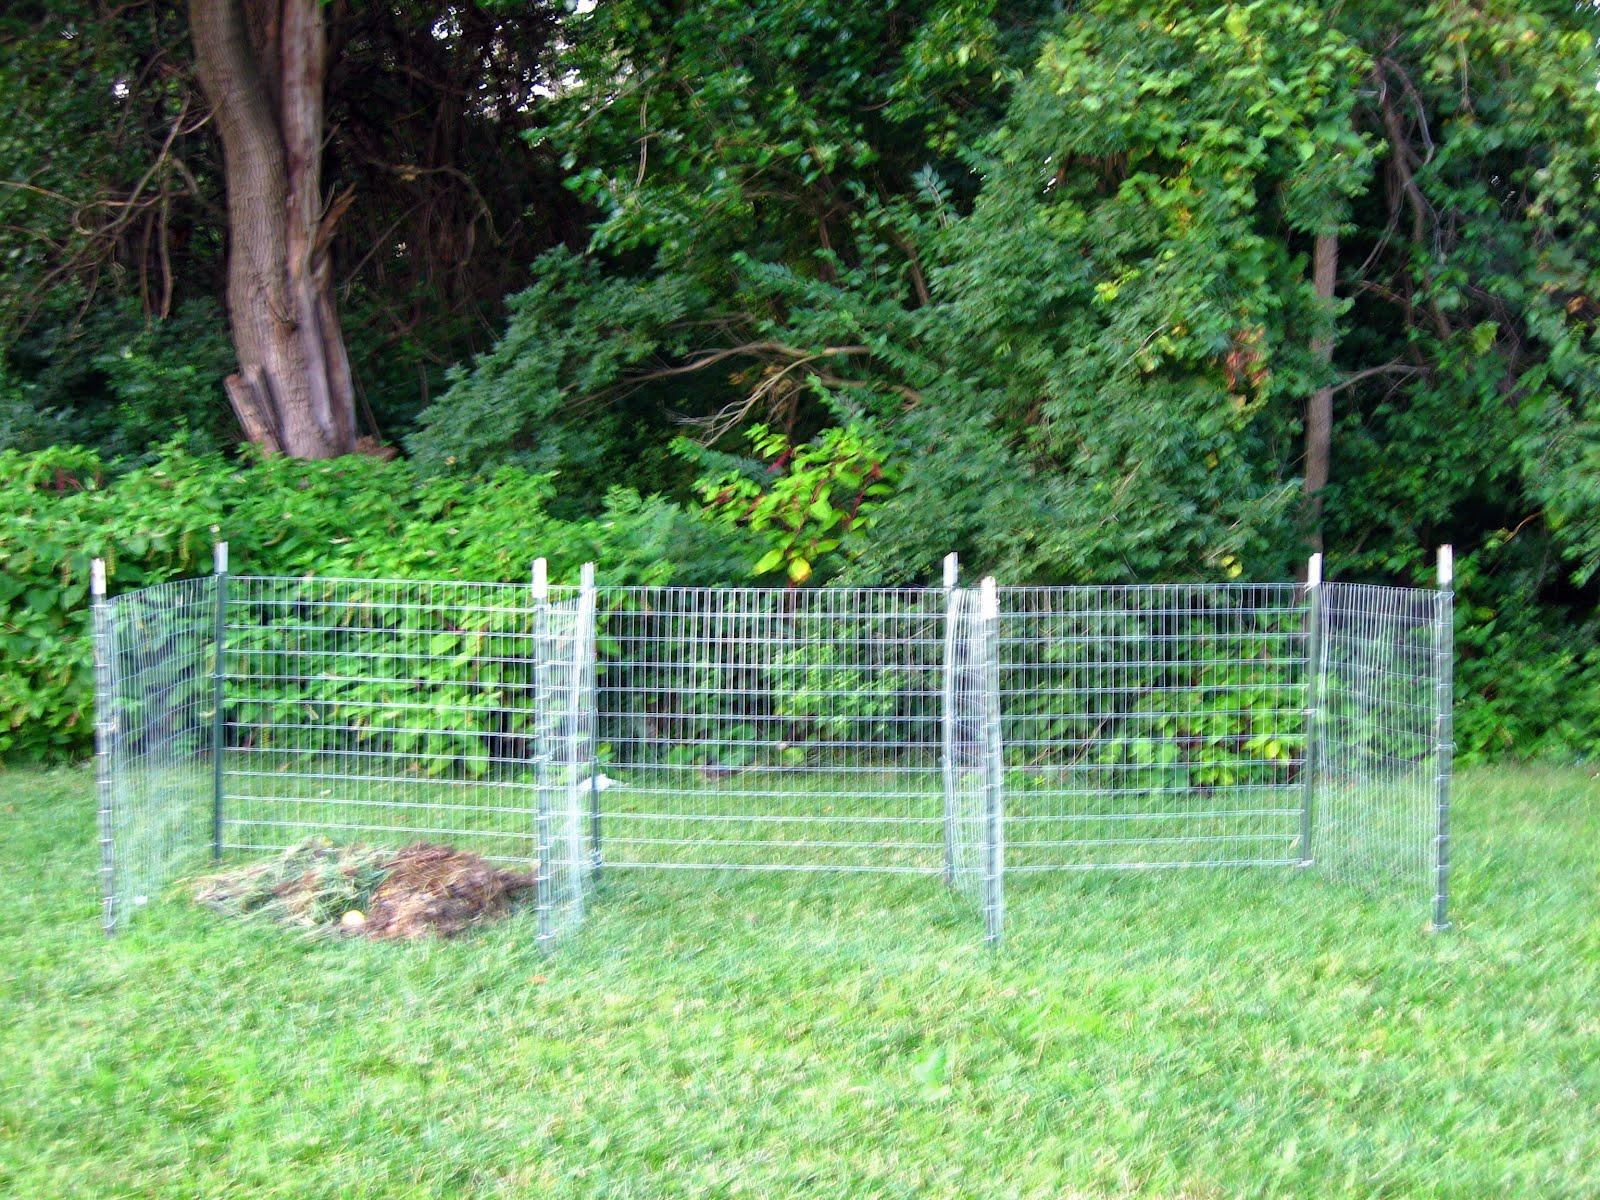 Stoddart Avenue Community Garden Ohio EPA Enacts New